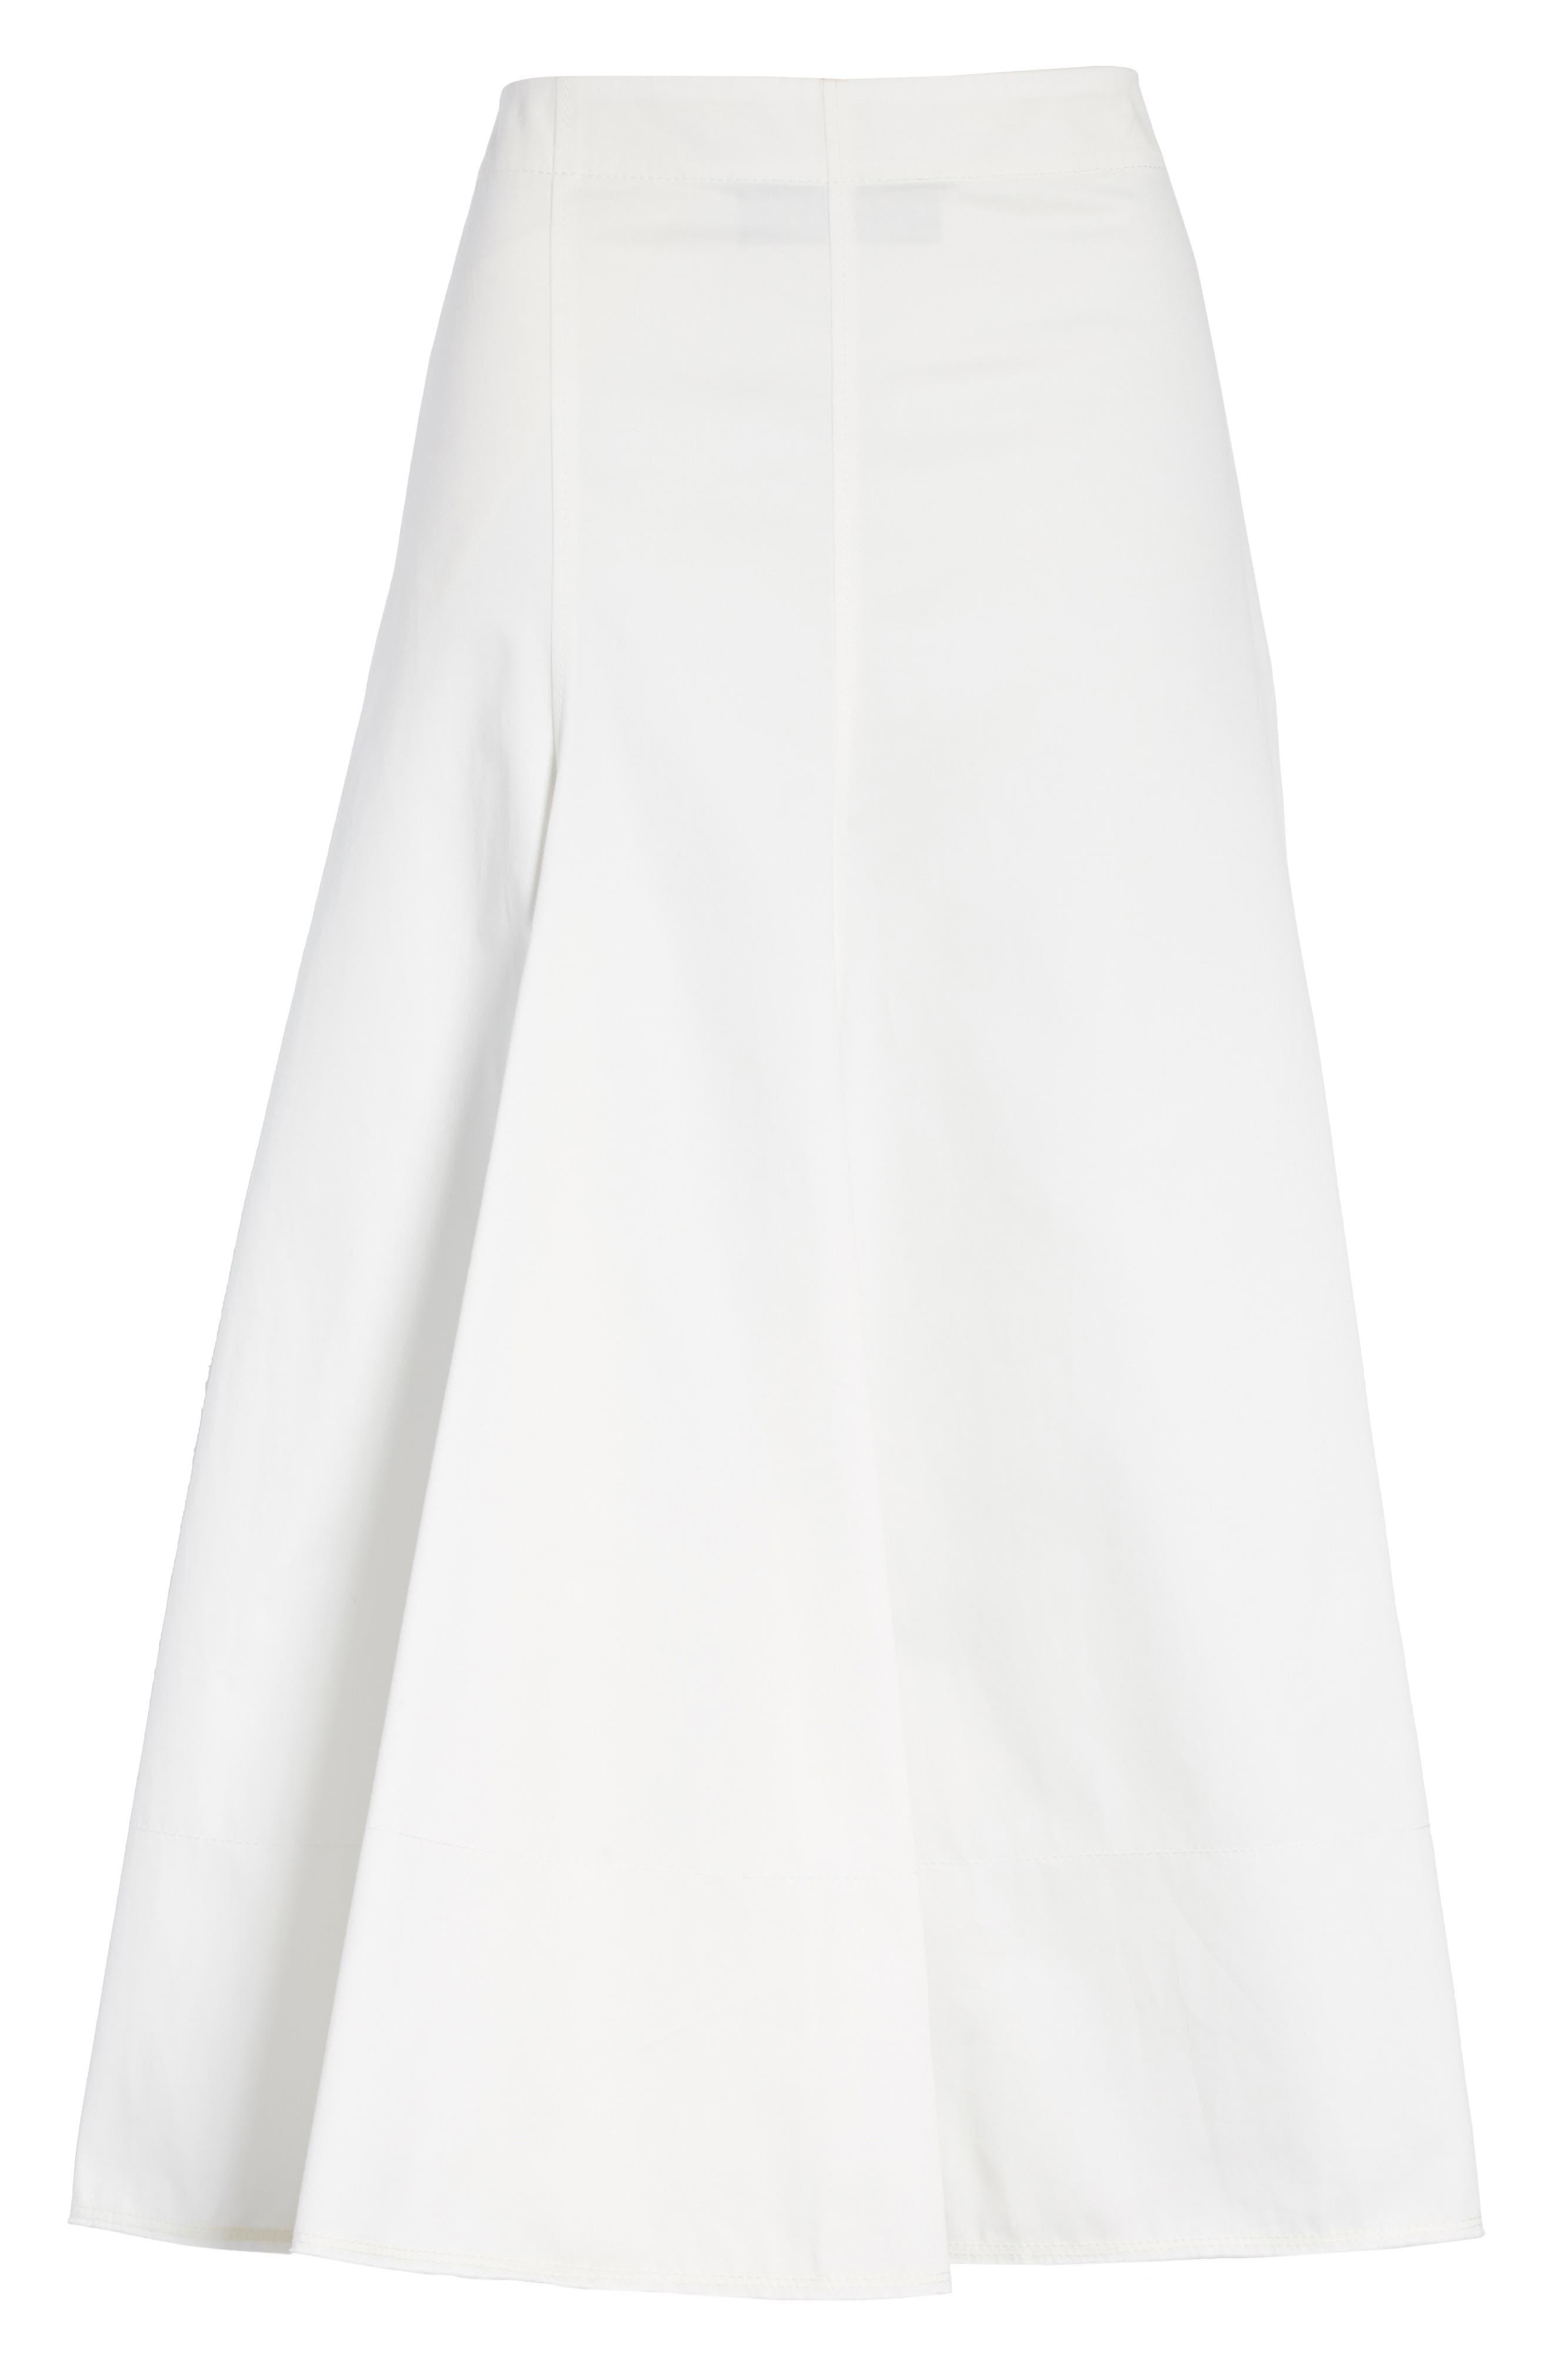 Twill Chino Midi Skirt,                             Alternate thumbnail 6, color,                             102